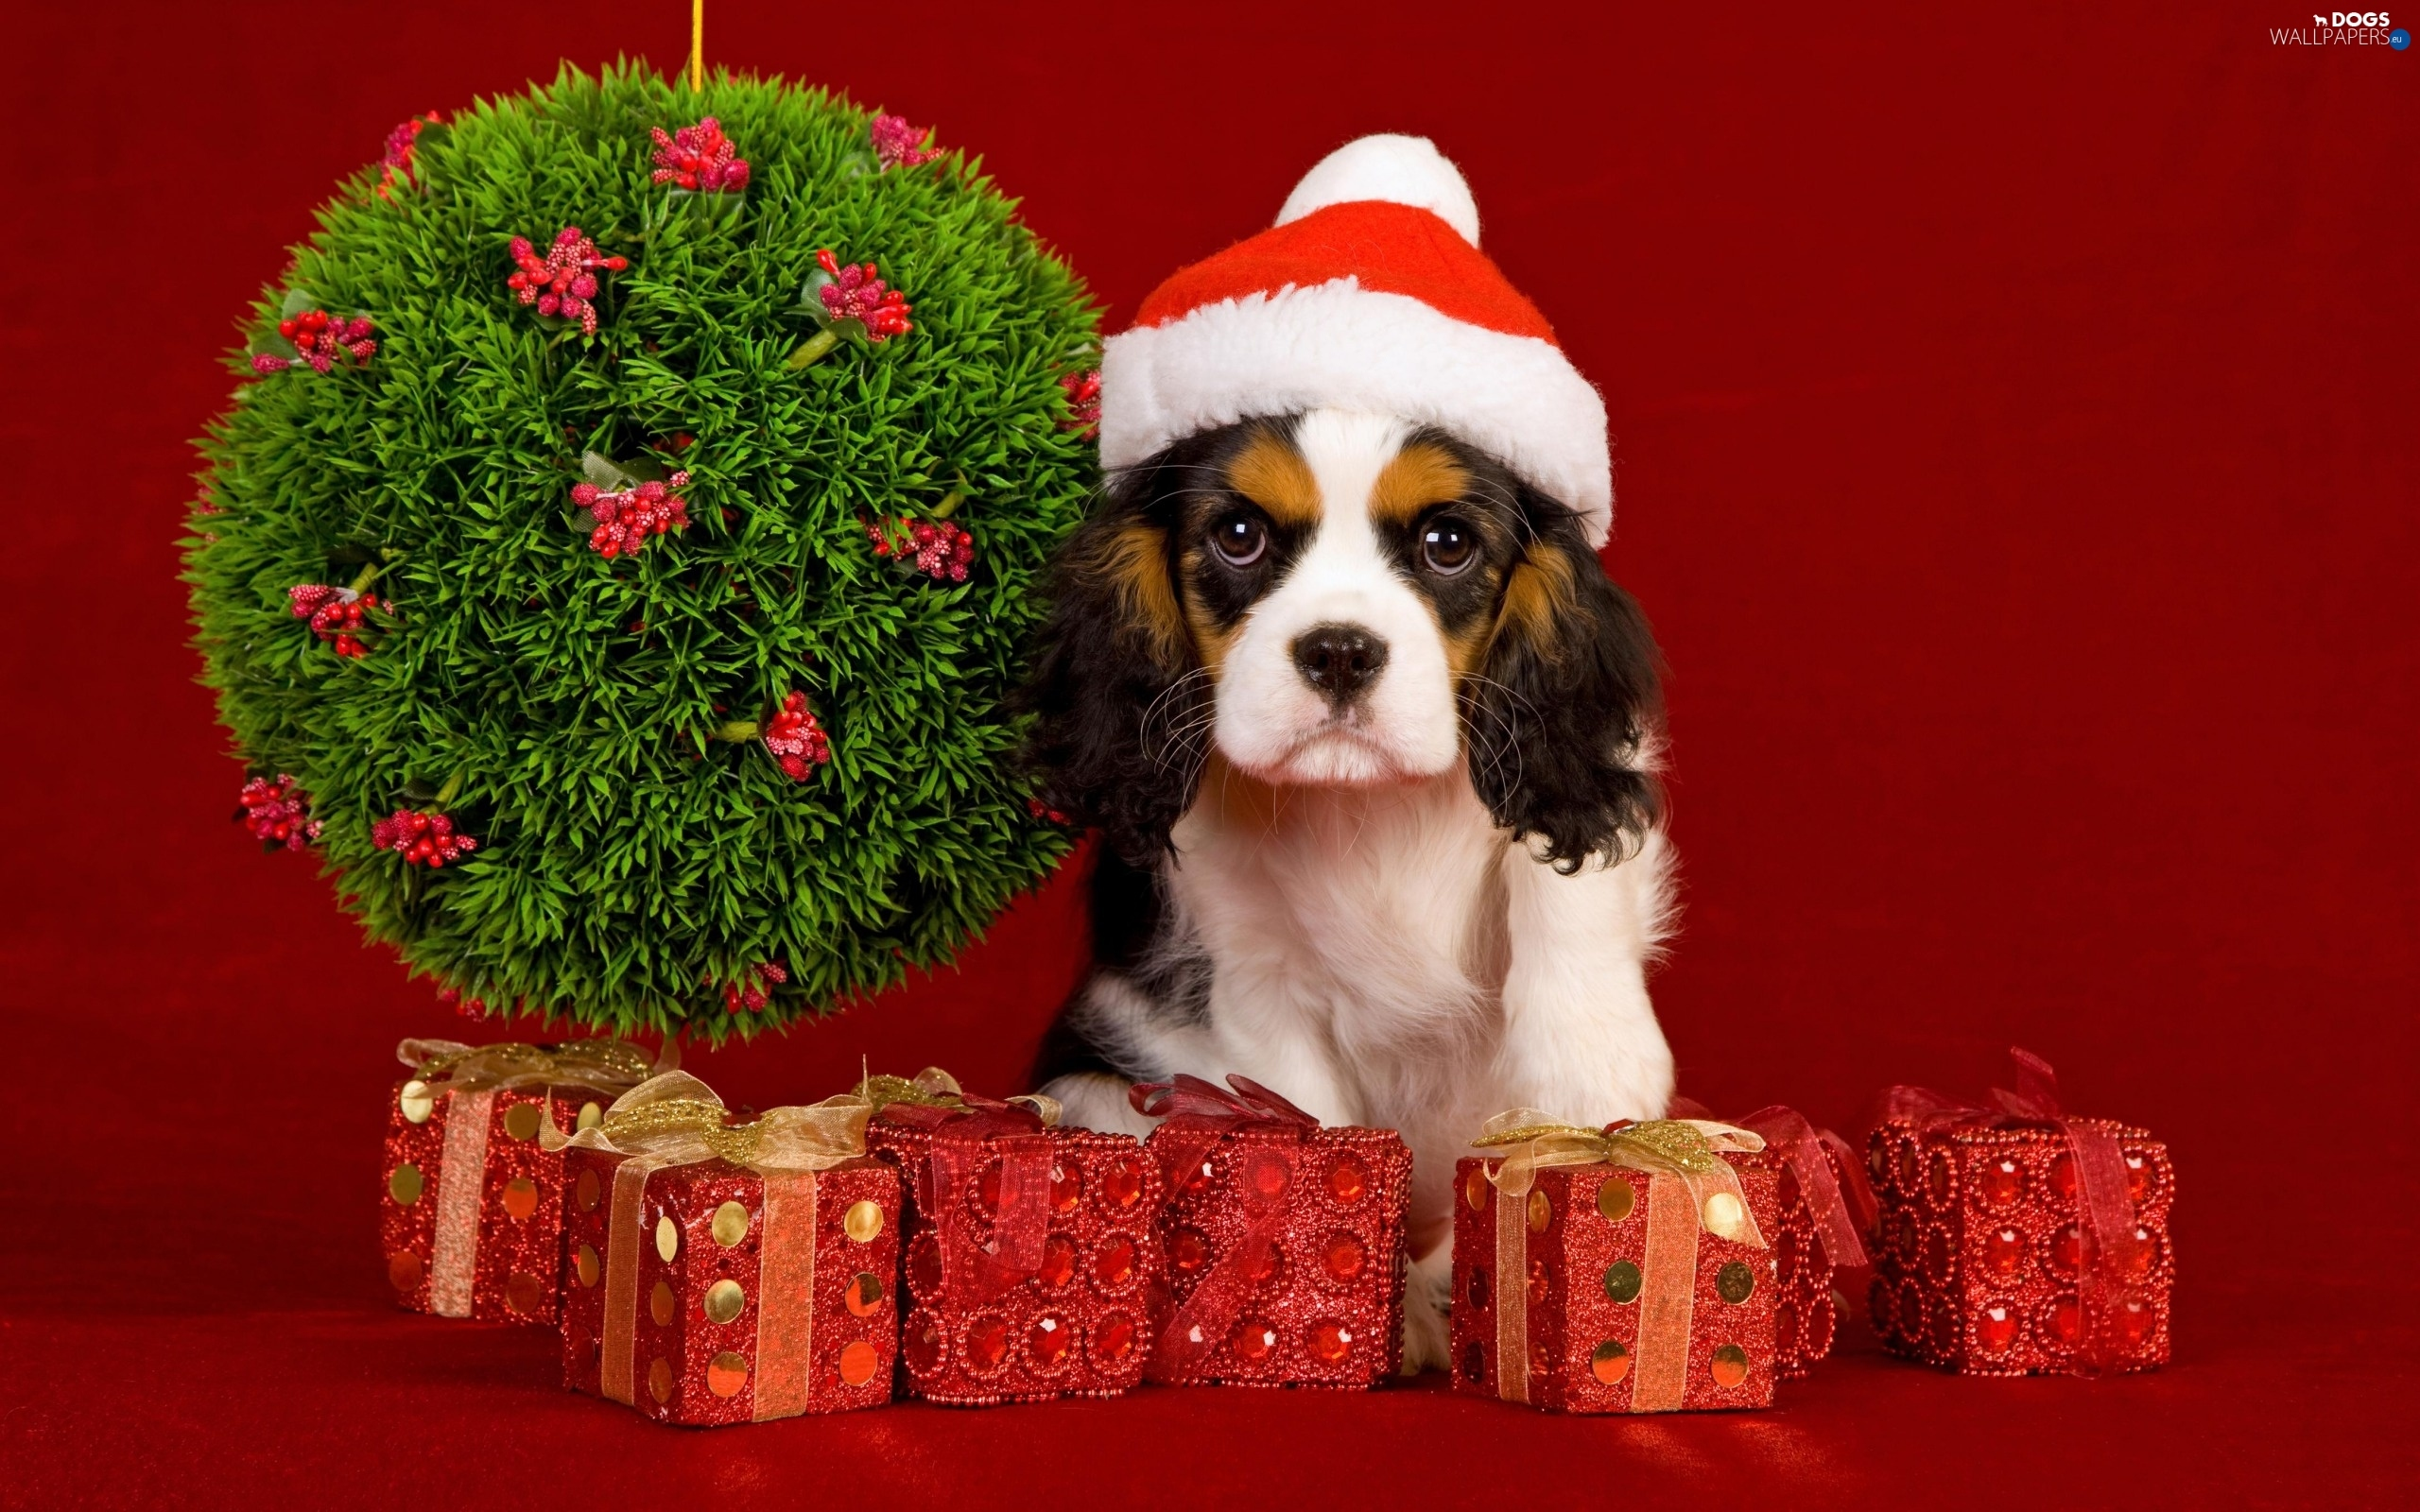 Bonnet, decor, dog, Christmas - Dogs wallpapers: 2560x1600